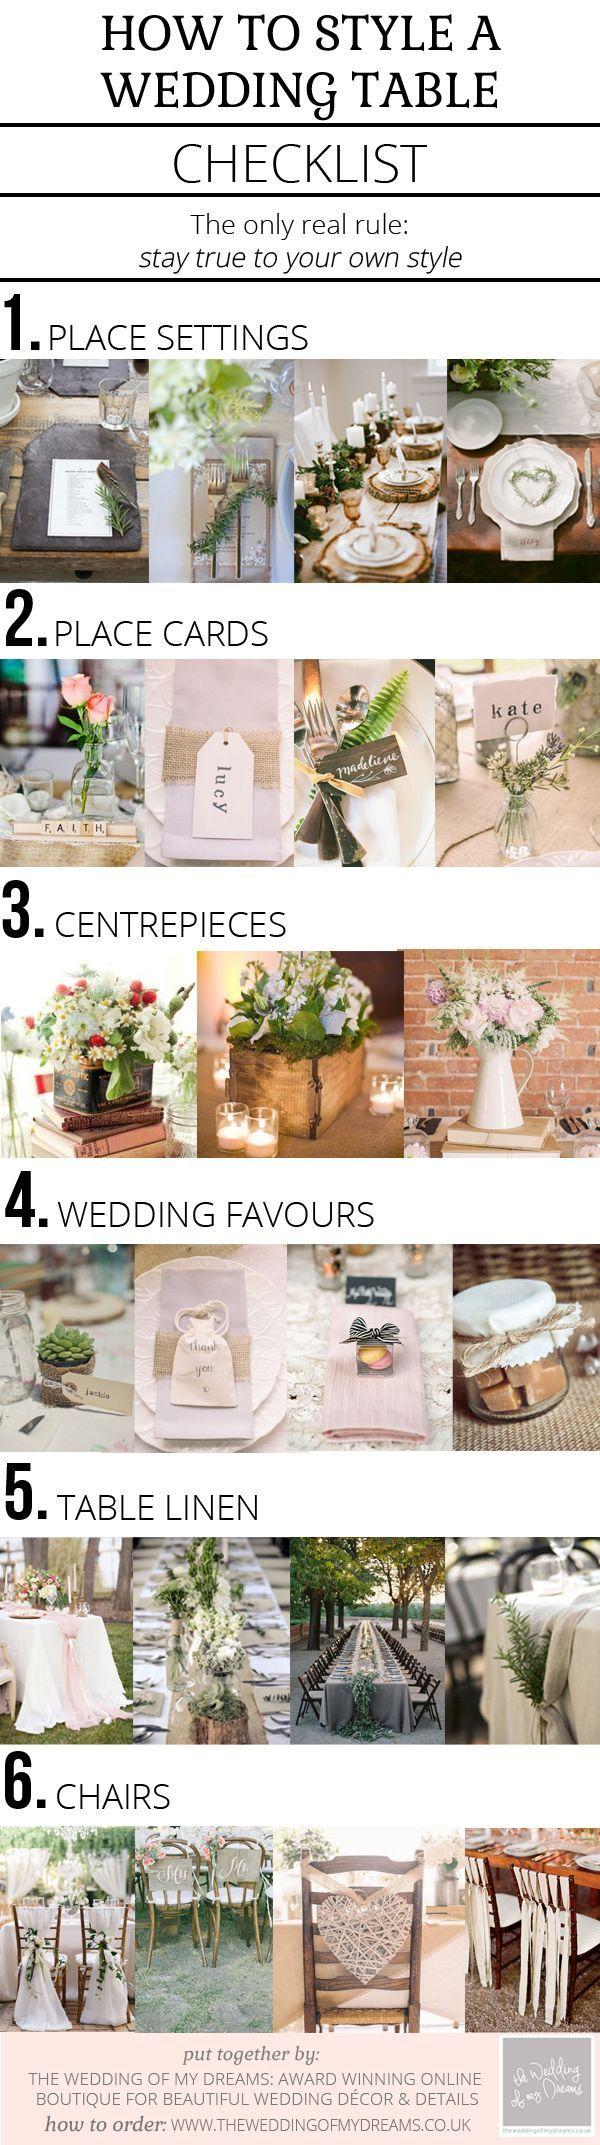 wedding planning checklist best photos Wedding tables Weddings